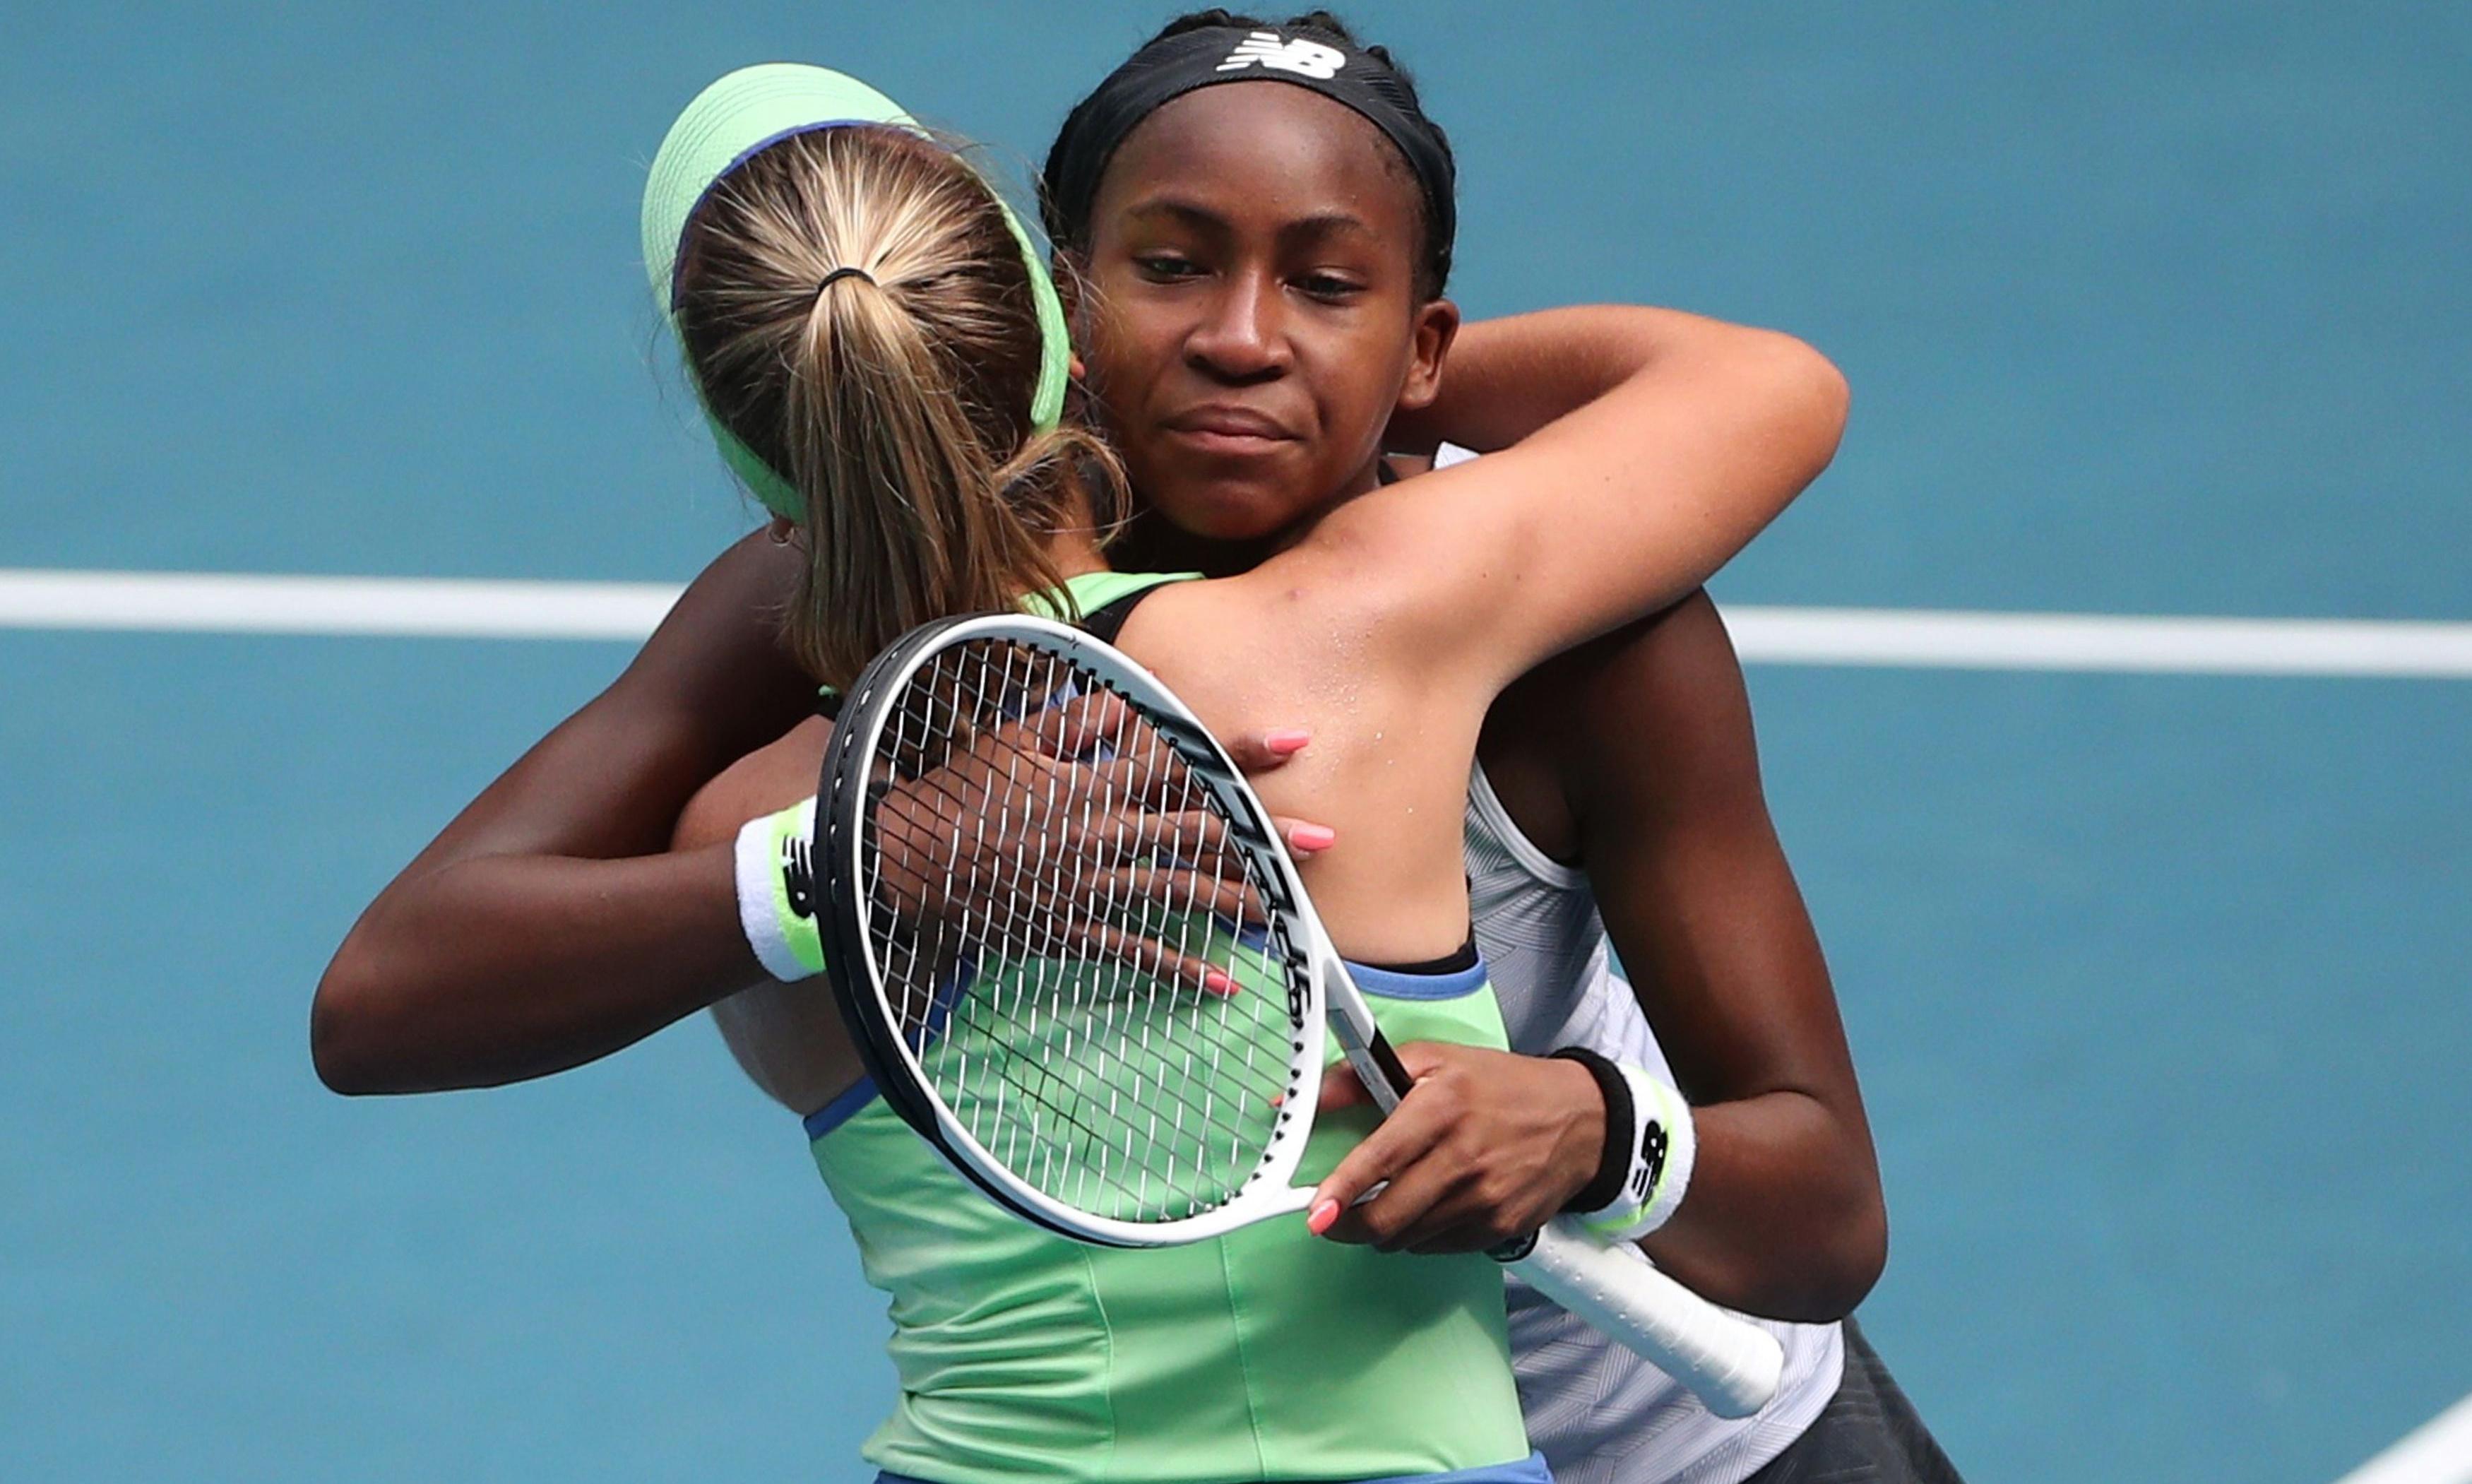 Coco Gauff's fairytale run at Australian Open ended by Sofia Kenin